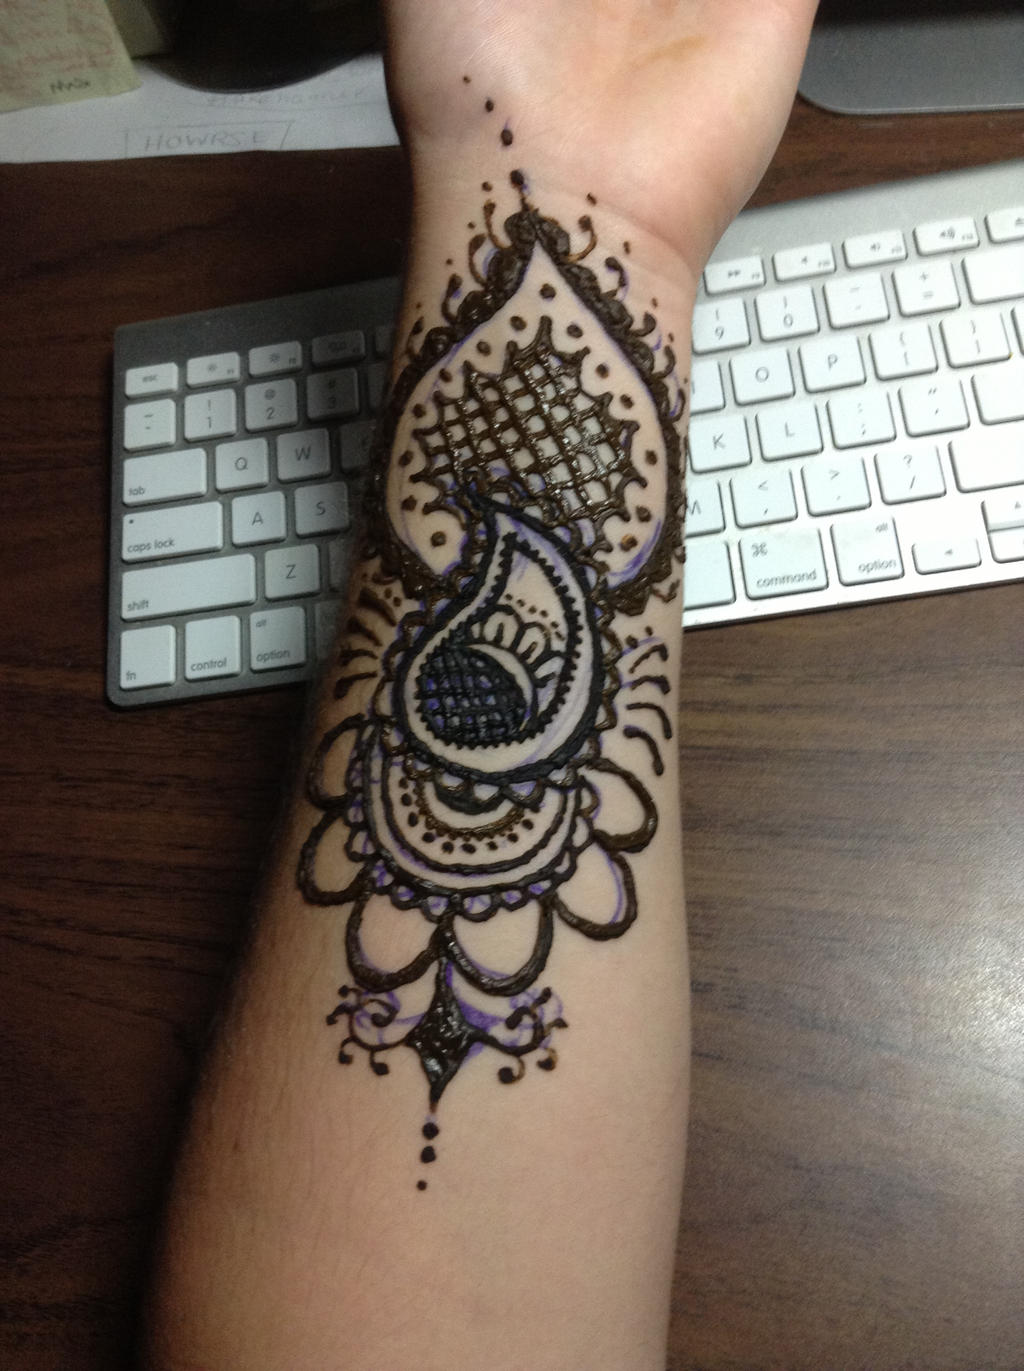 Henna Arm Tattoo Designs: Henna Arm Tattoo By BlackWaterPanther On DeviantArt